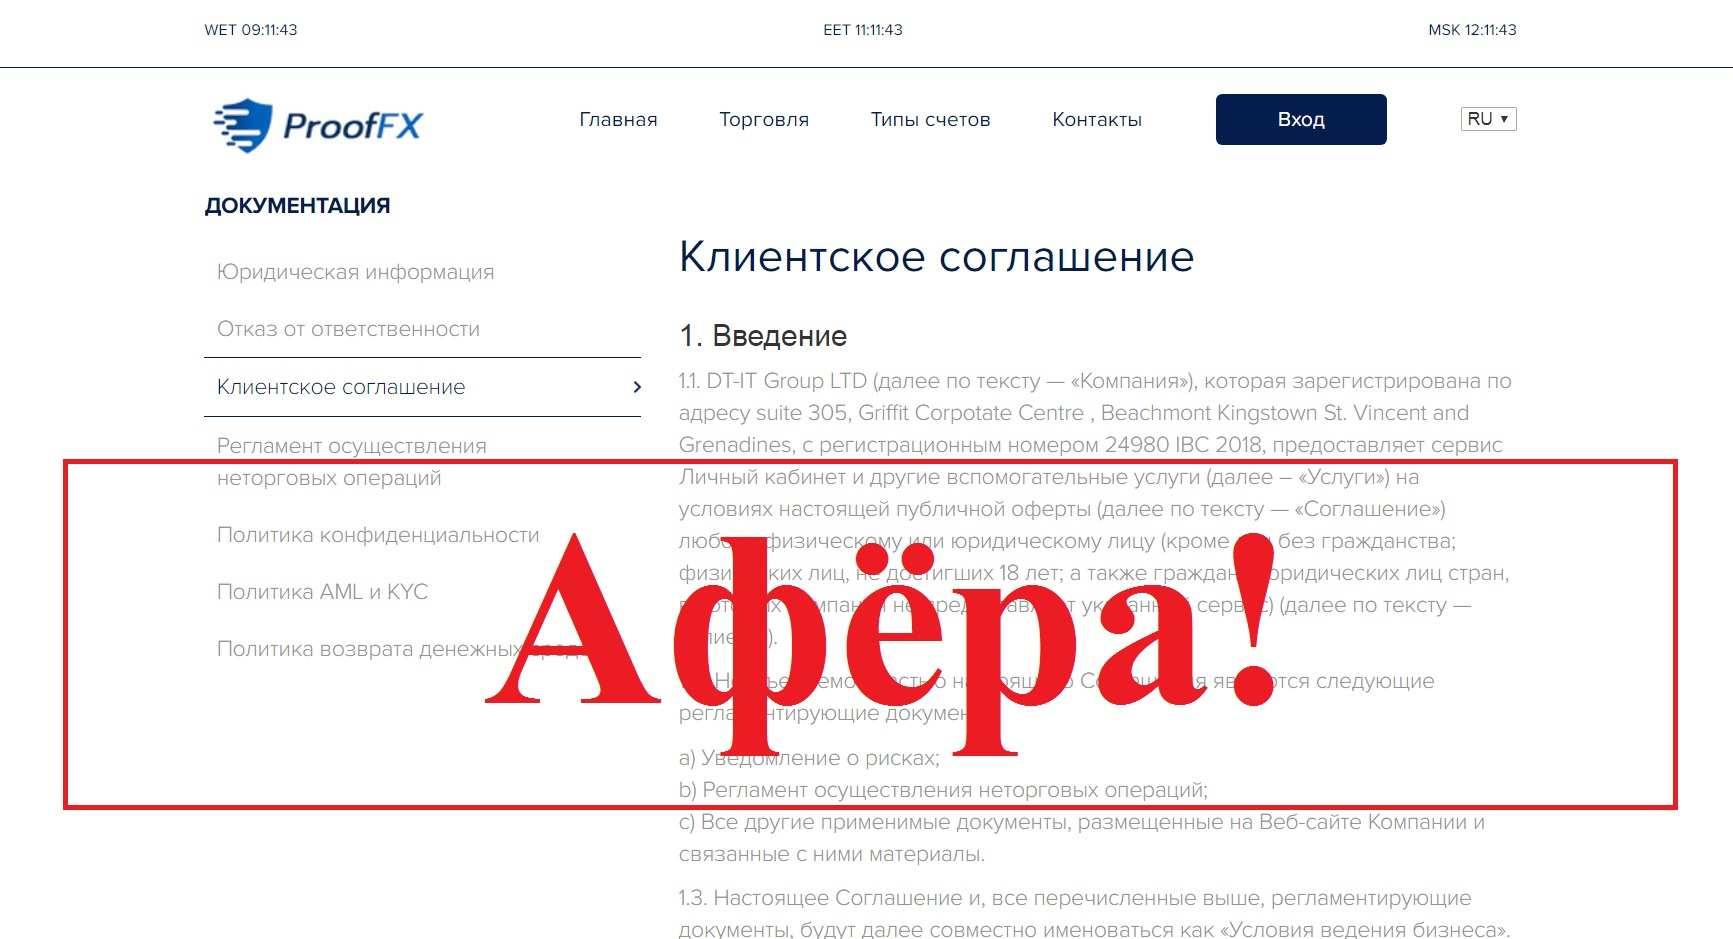 ProofFX – отзывы о брокере prooffx.com